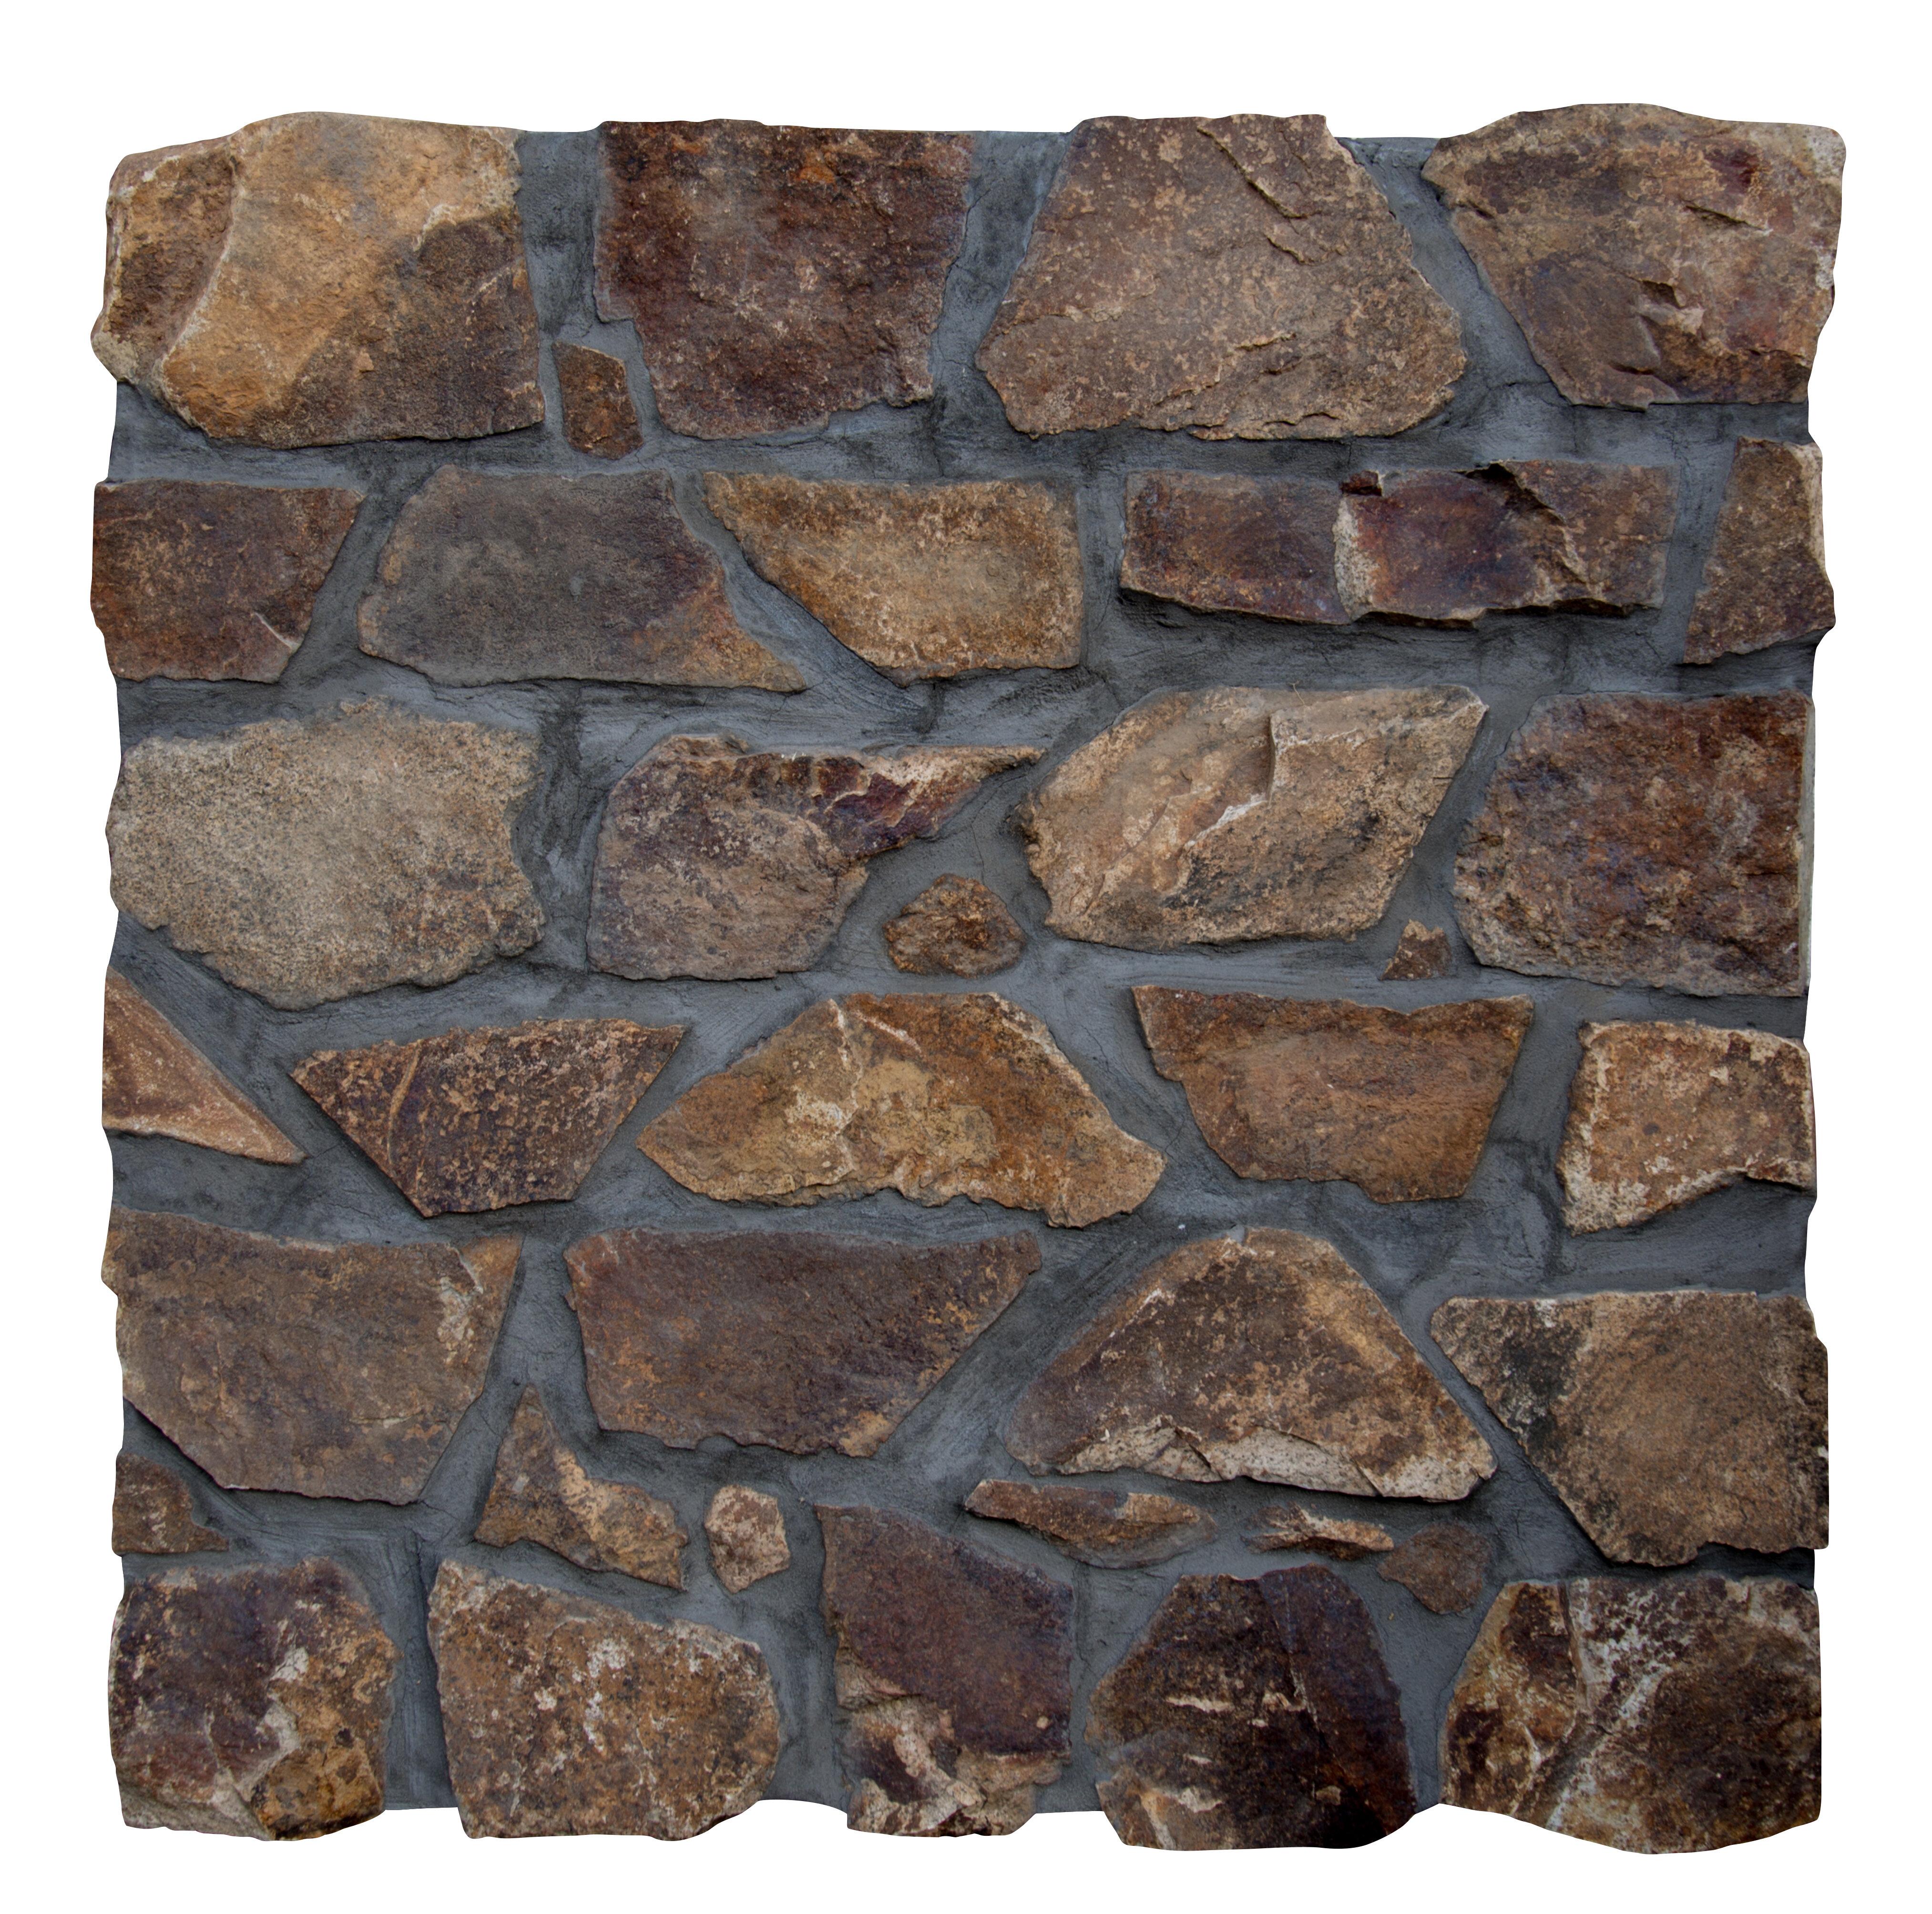 Msi castle earth loose veneer random sized natural stone tile tile msi castle earth loose veneer random sized natural stone tile tile in brown reviews wayfair dailygadgetfo Choice Image